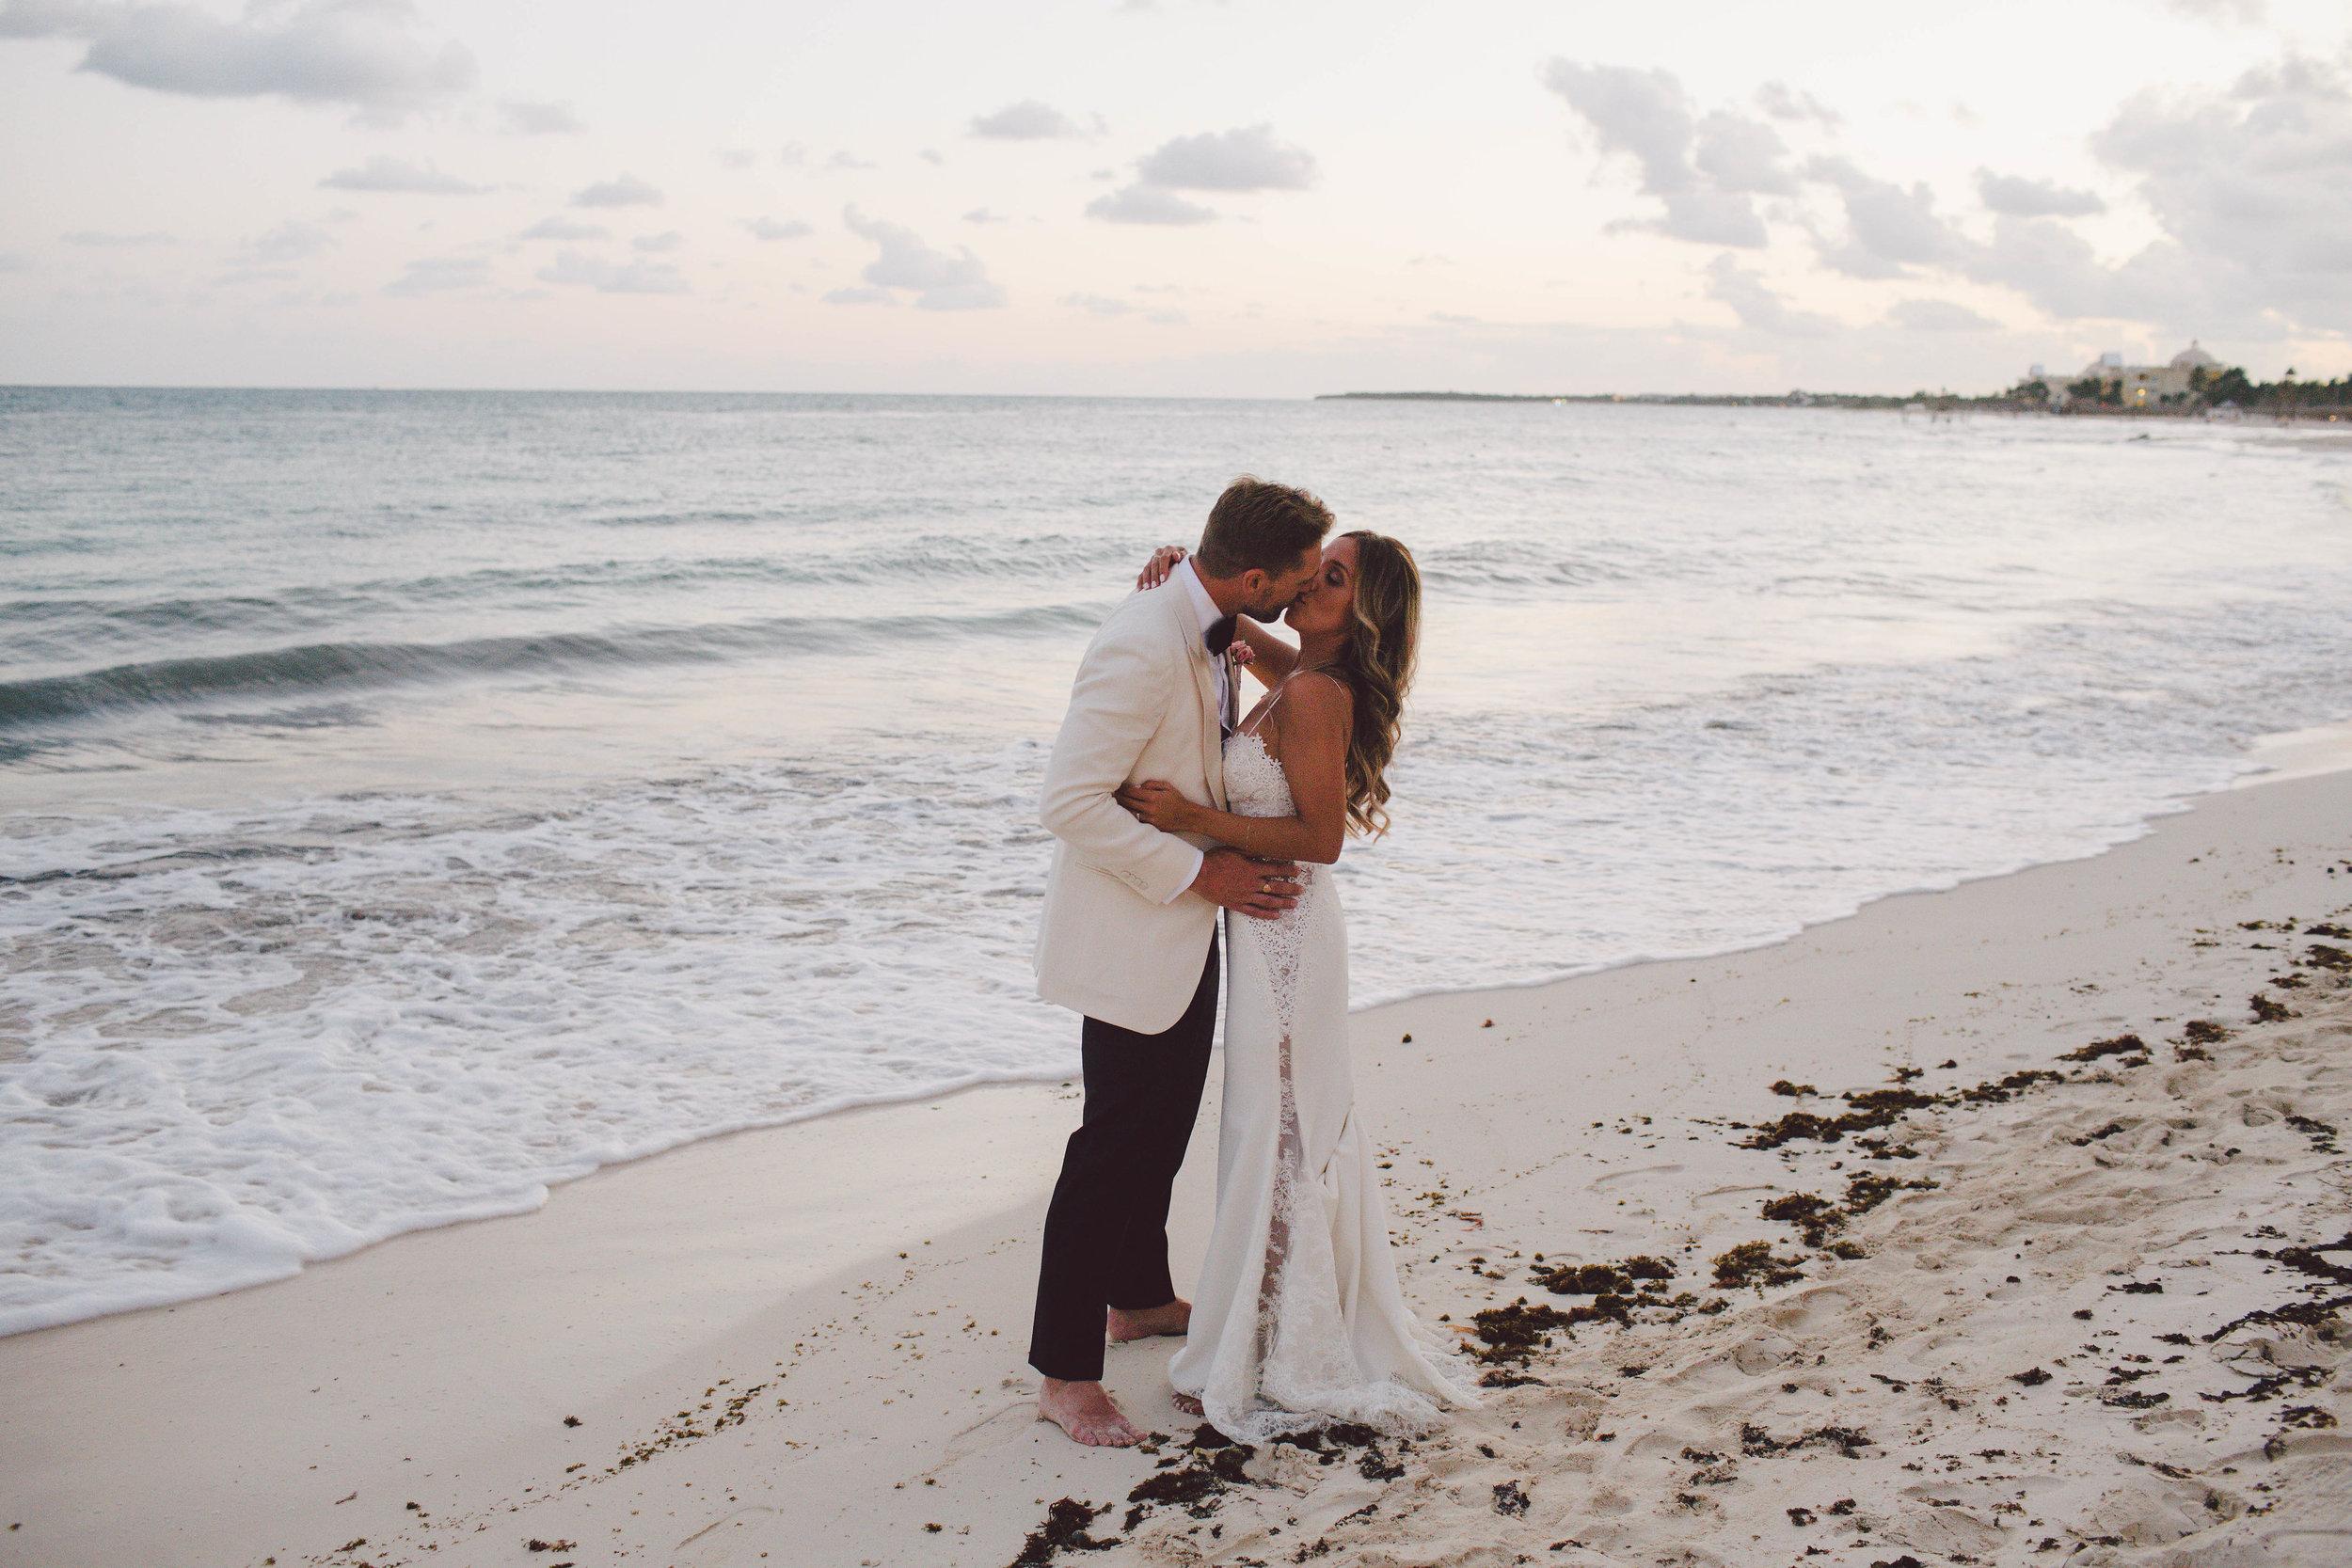 mexico_wedding_cancun_villa_la_joya_evangeline_lane_129.jpg